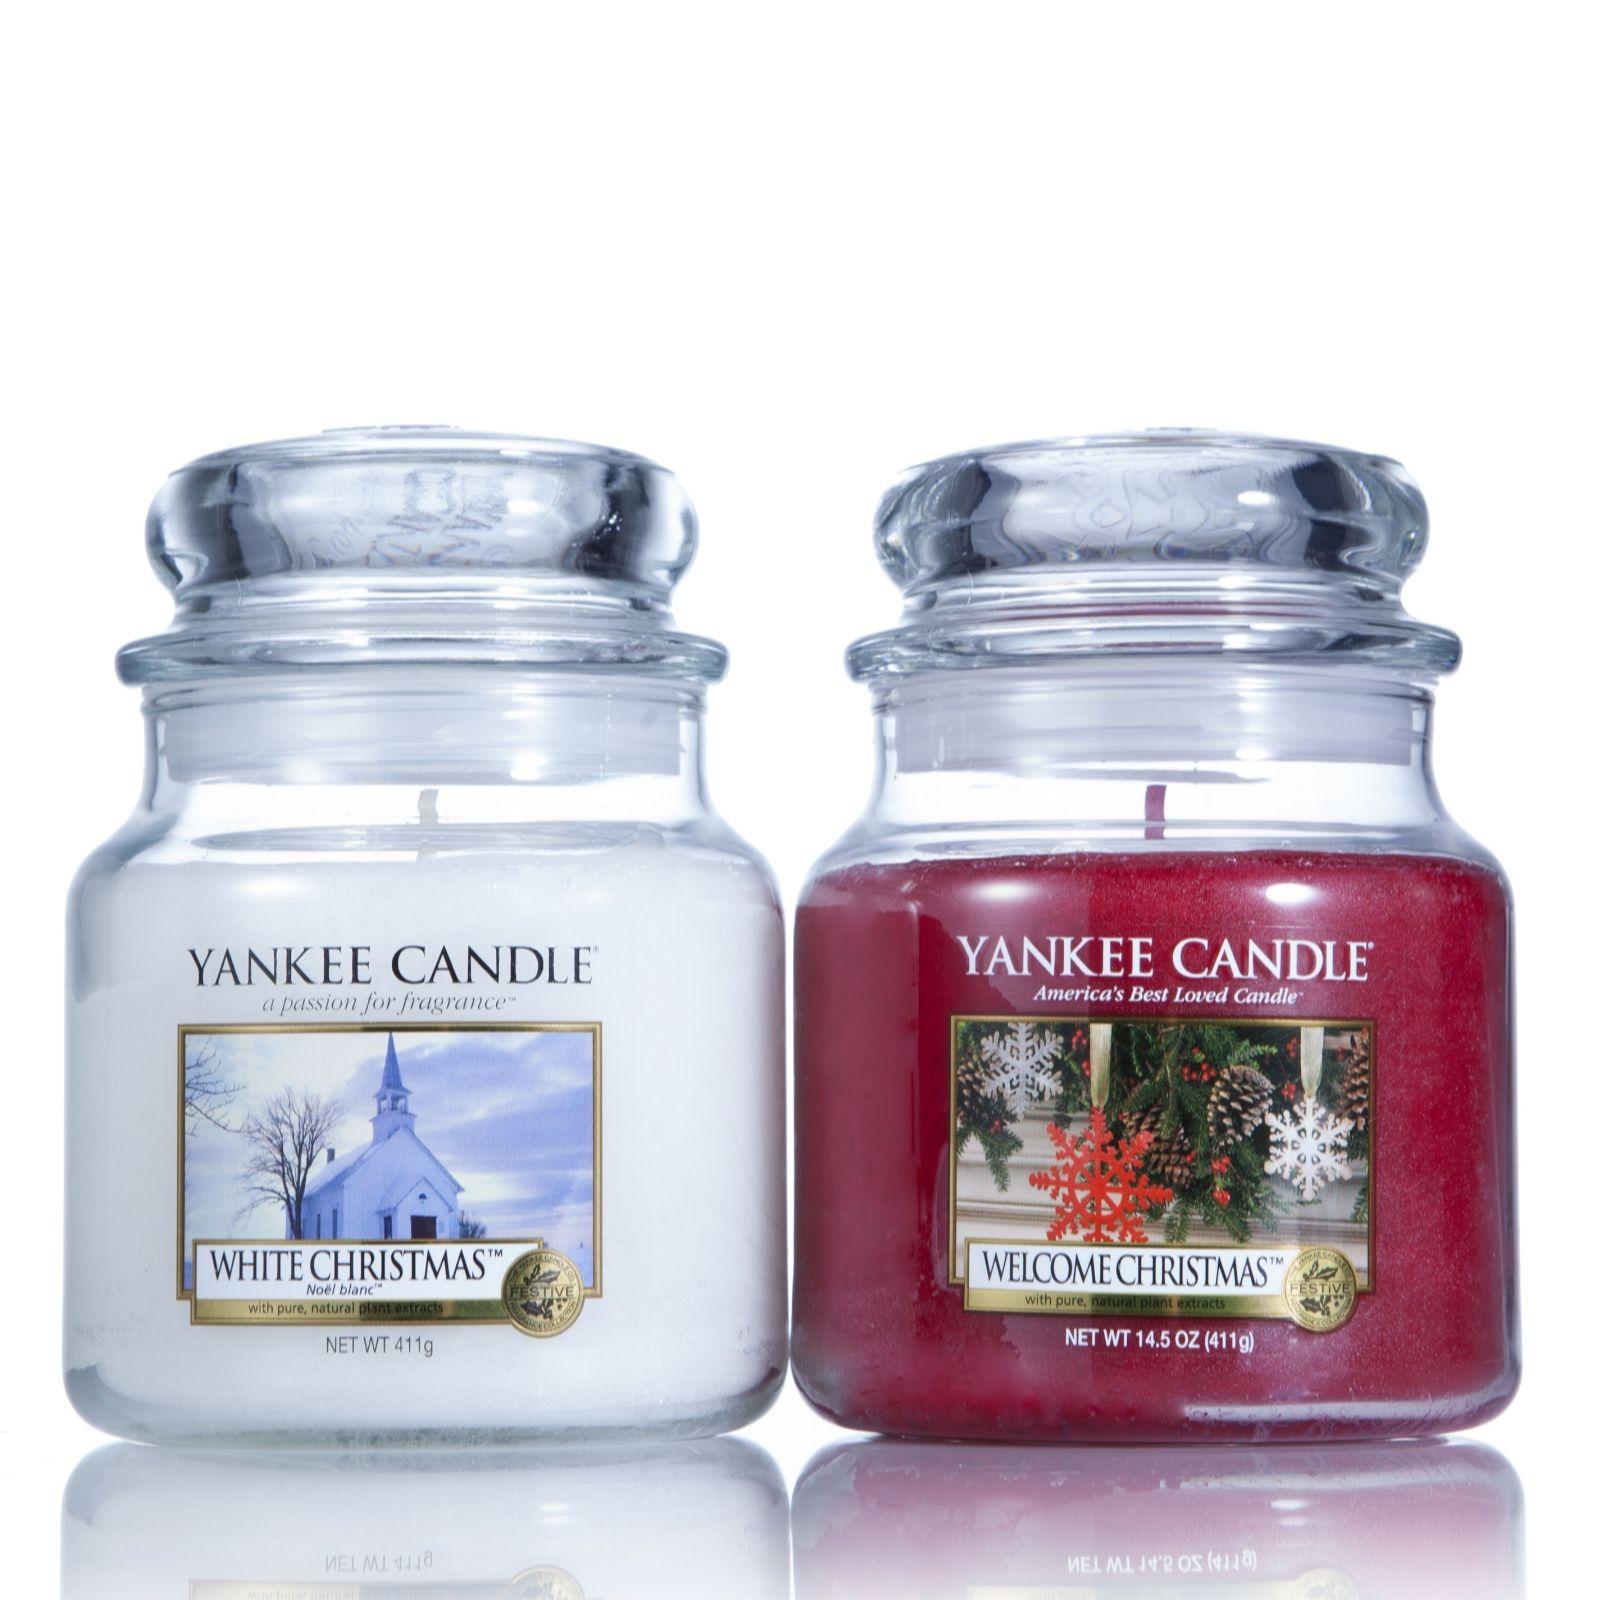 yankee candle 2 medium jar christmas gift set page 1 qvc uk - Yankee Candle White Christmas